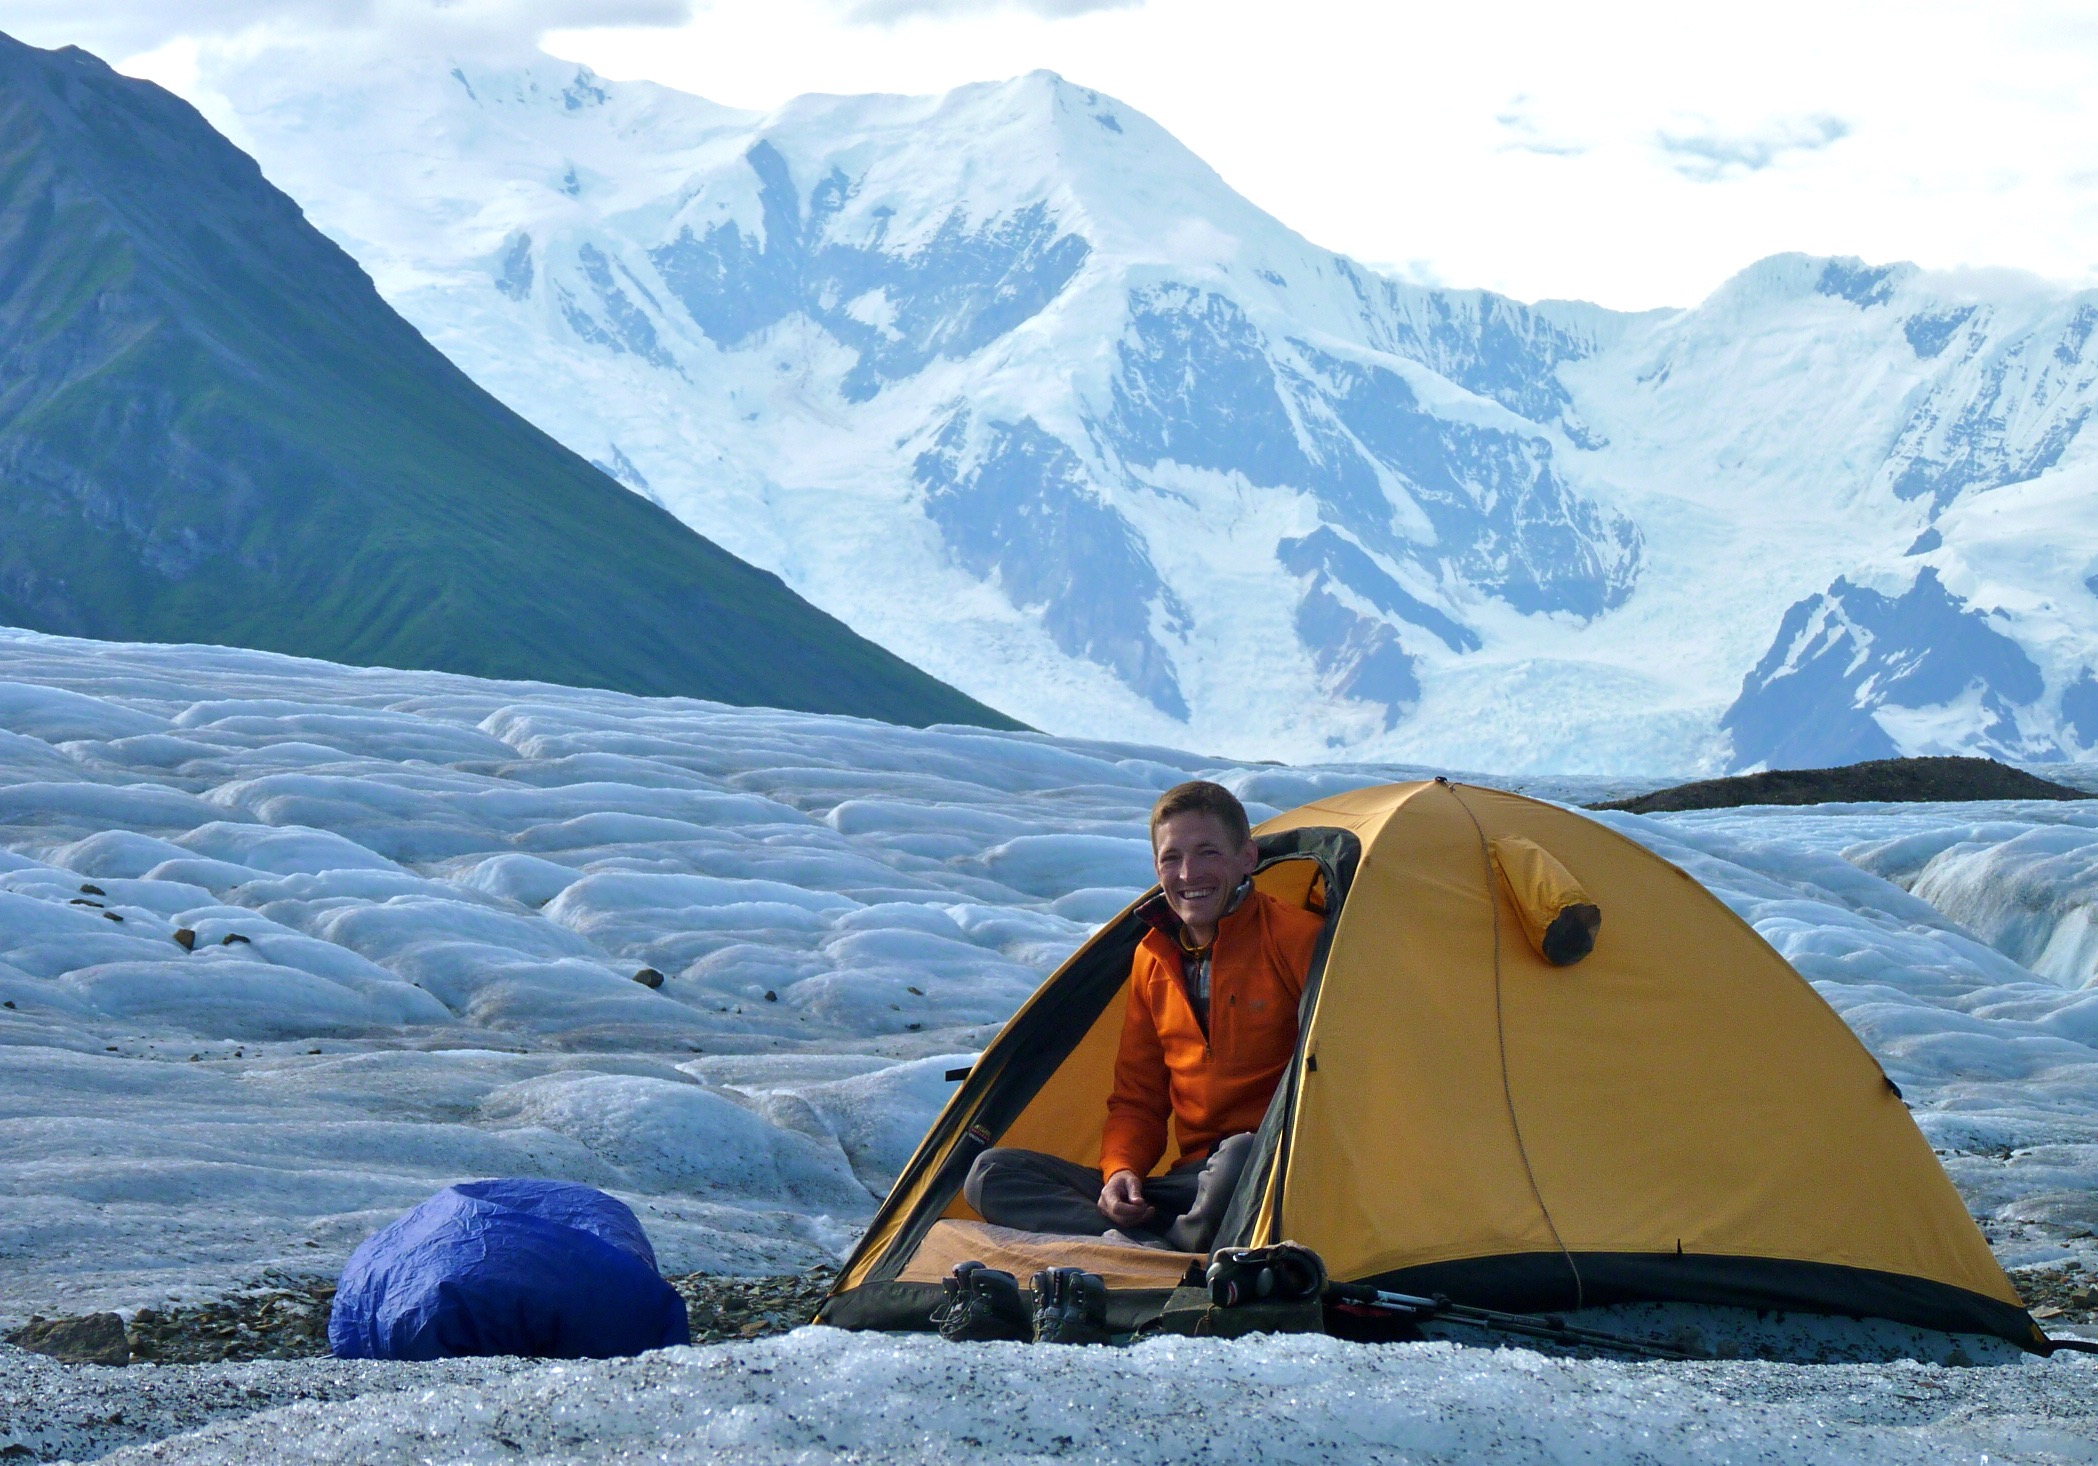 camping on a glacier